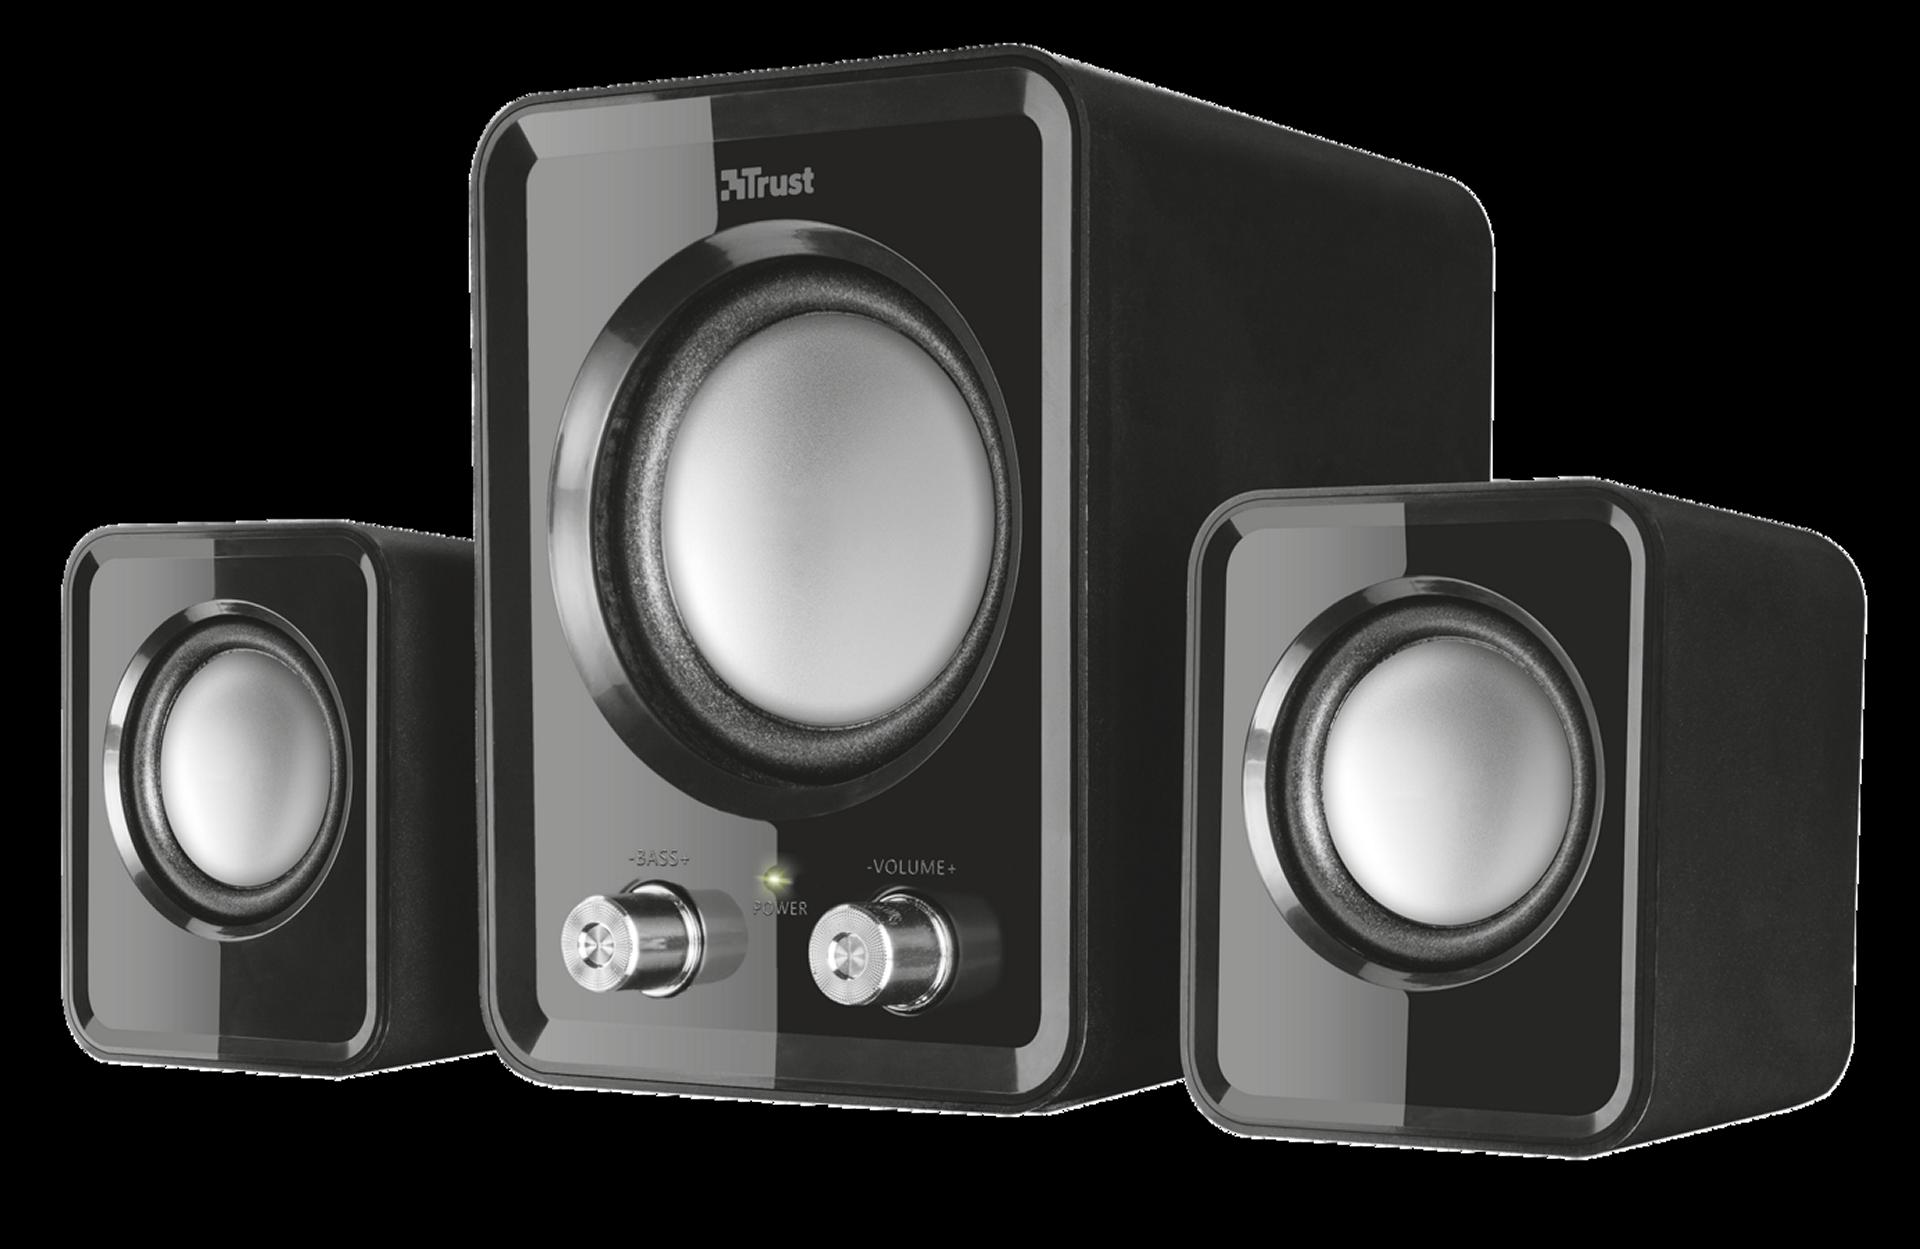 zvuk. systém TRUST Ziva 2.1 Compact Speaker Set - 21525